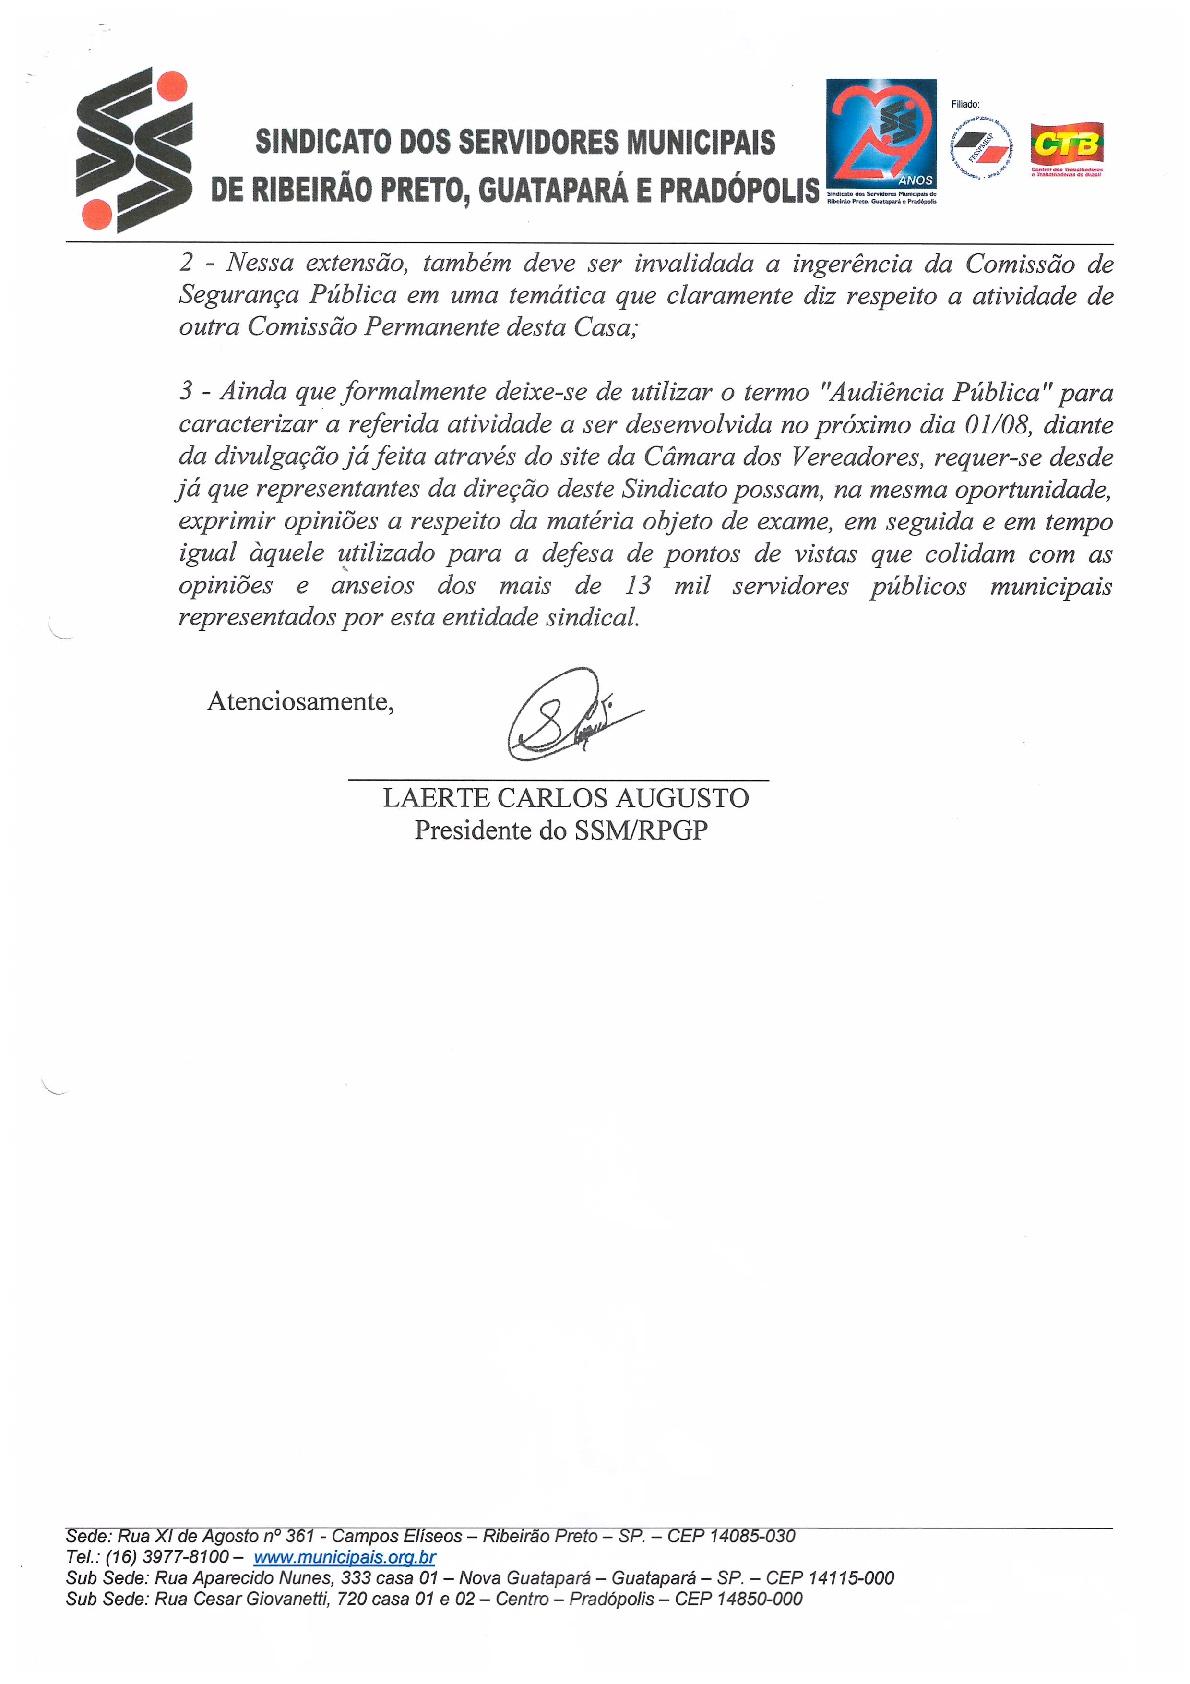 Protocolo-Camara-Audiencia-IPM-003